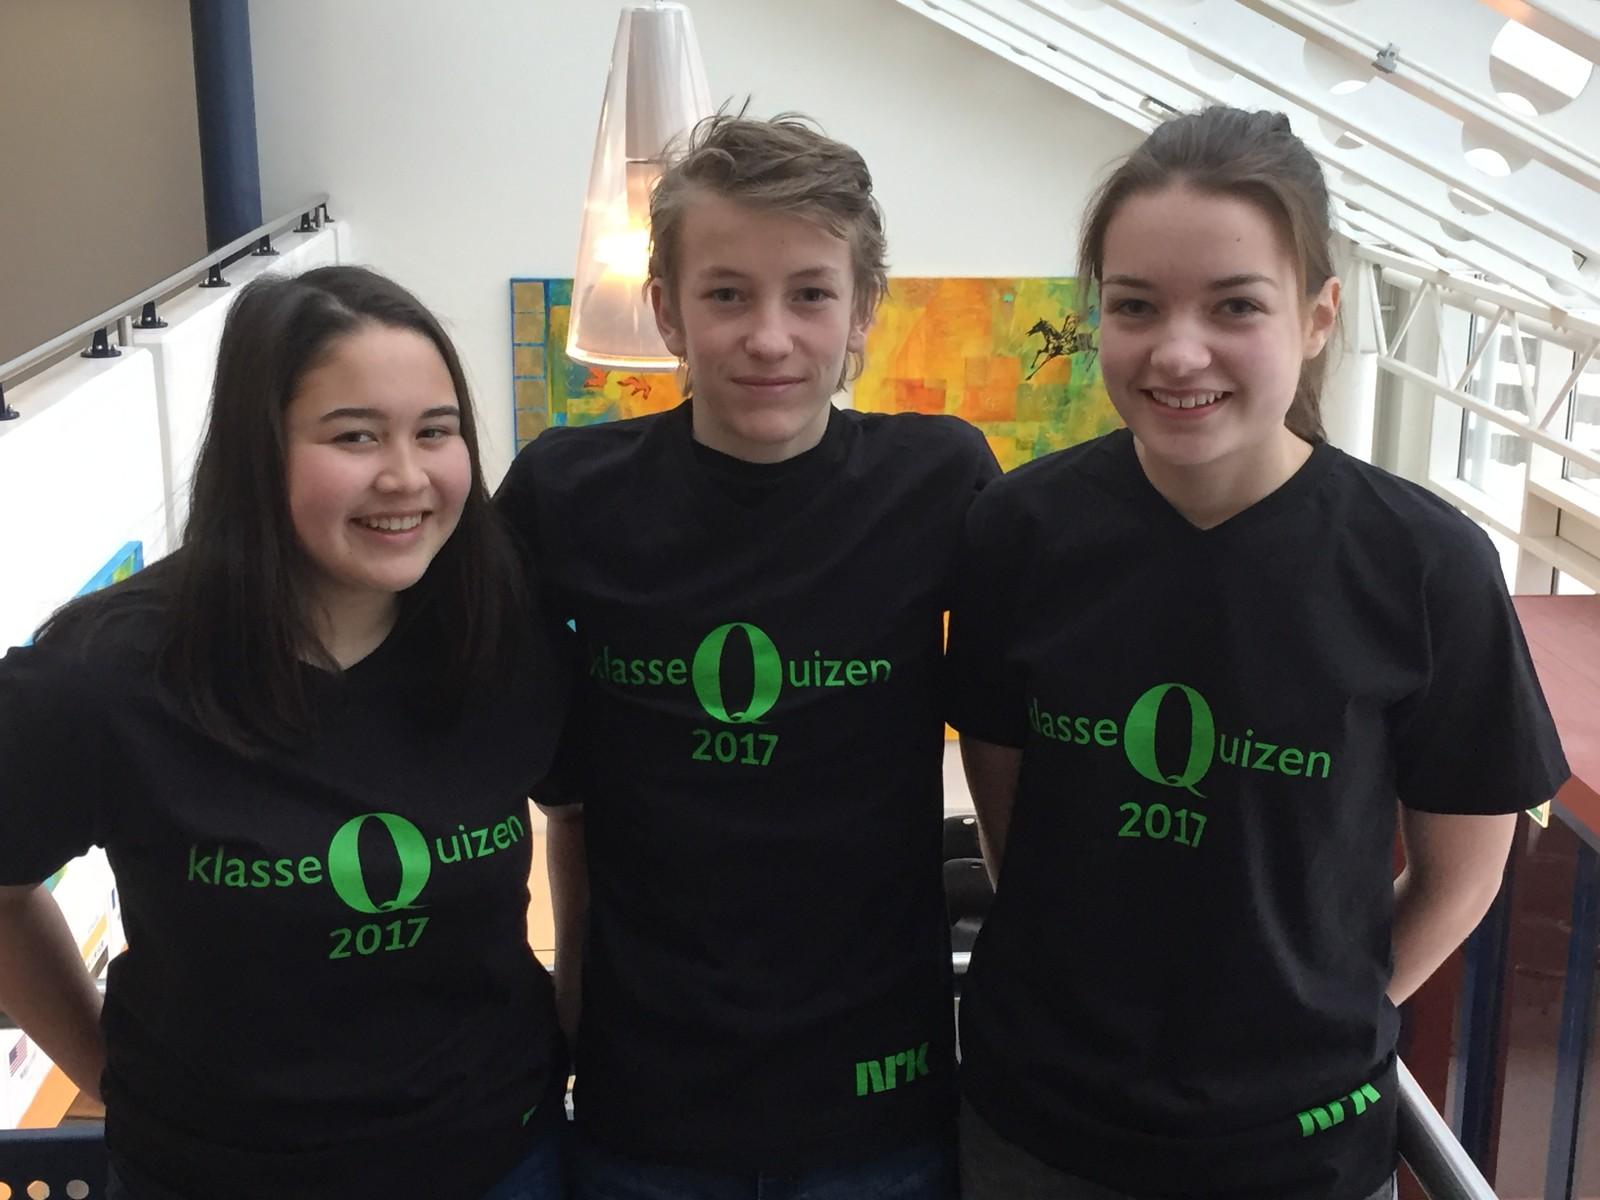 Victoria Røed, Viktor Bilstad og Ingrid Granum fra Hammartun skole klarte åtte rette.